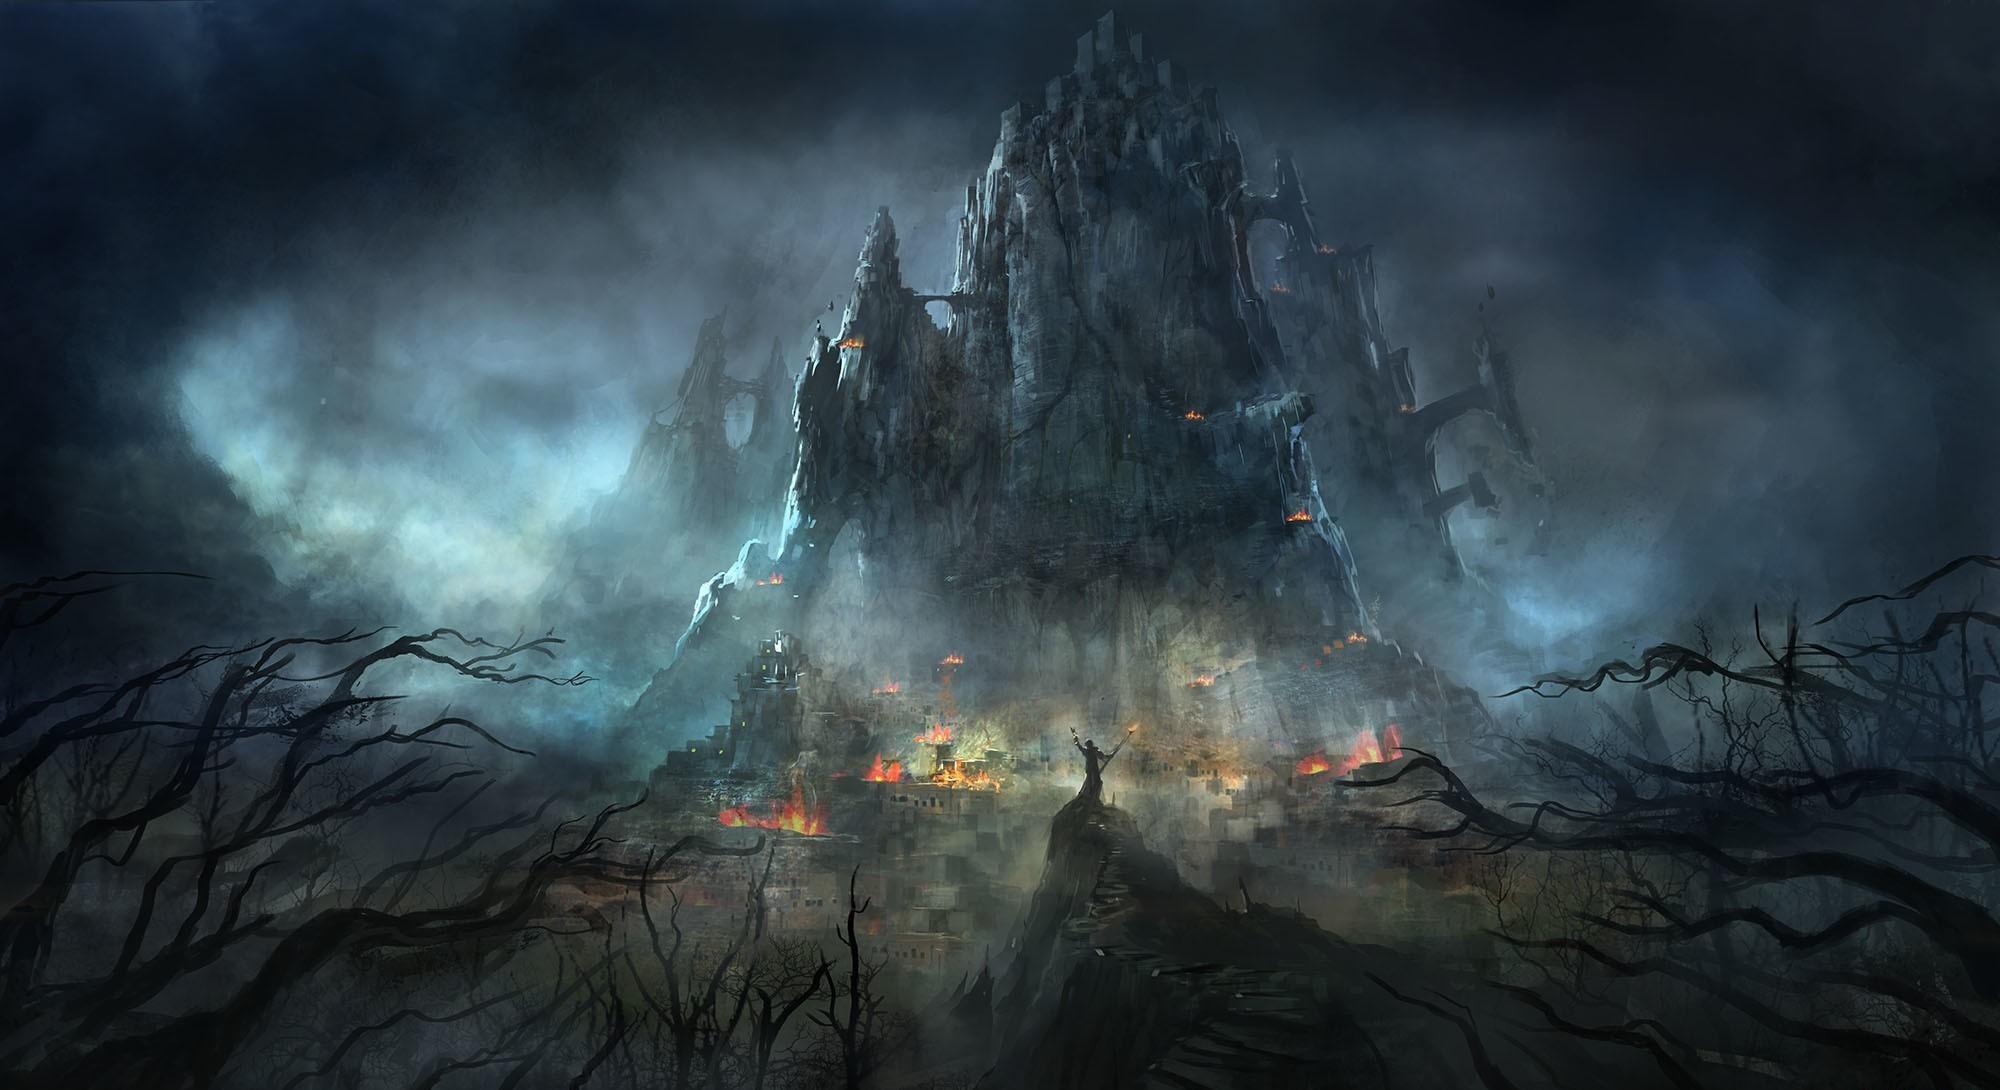 Картинки фэнтези мрак